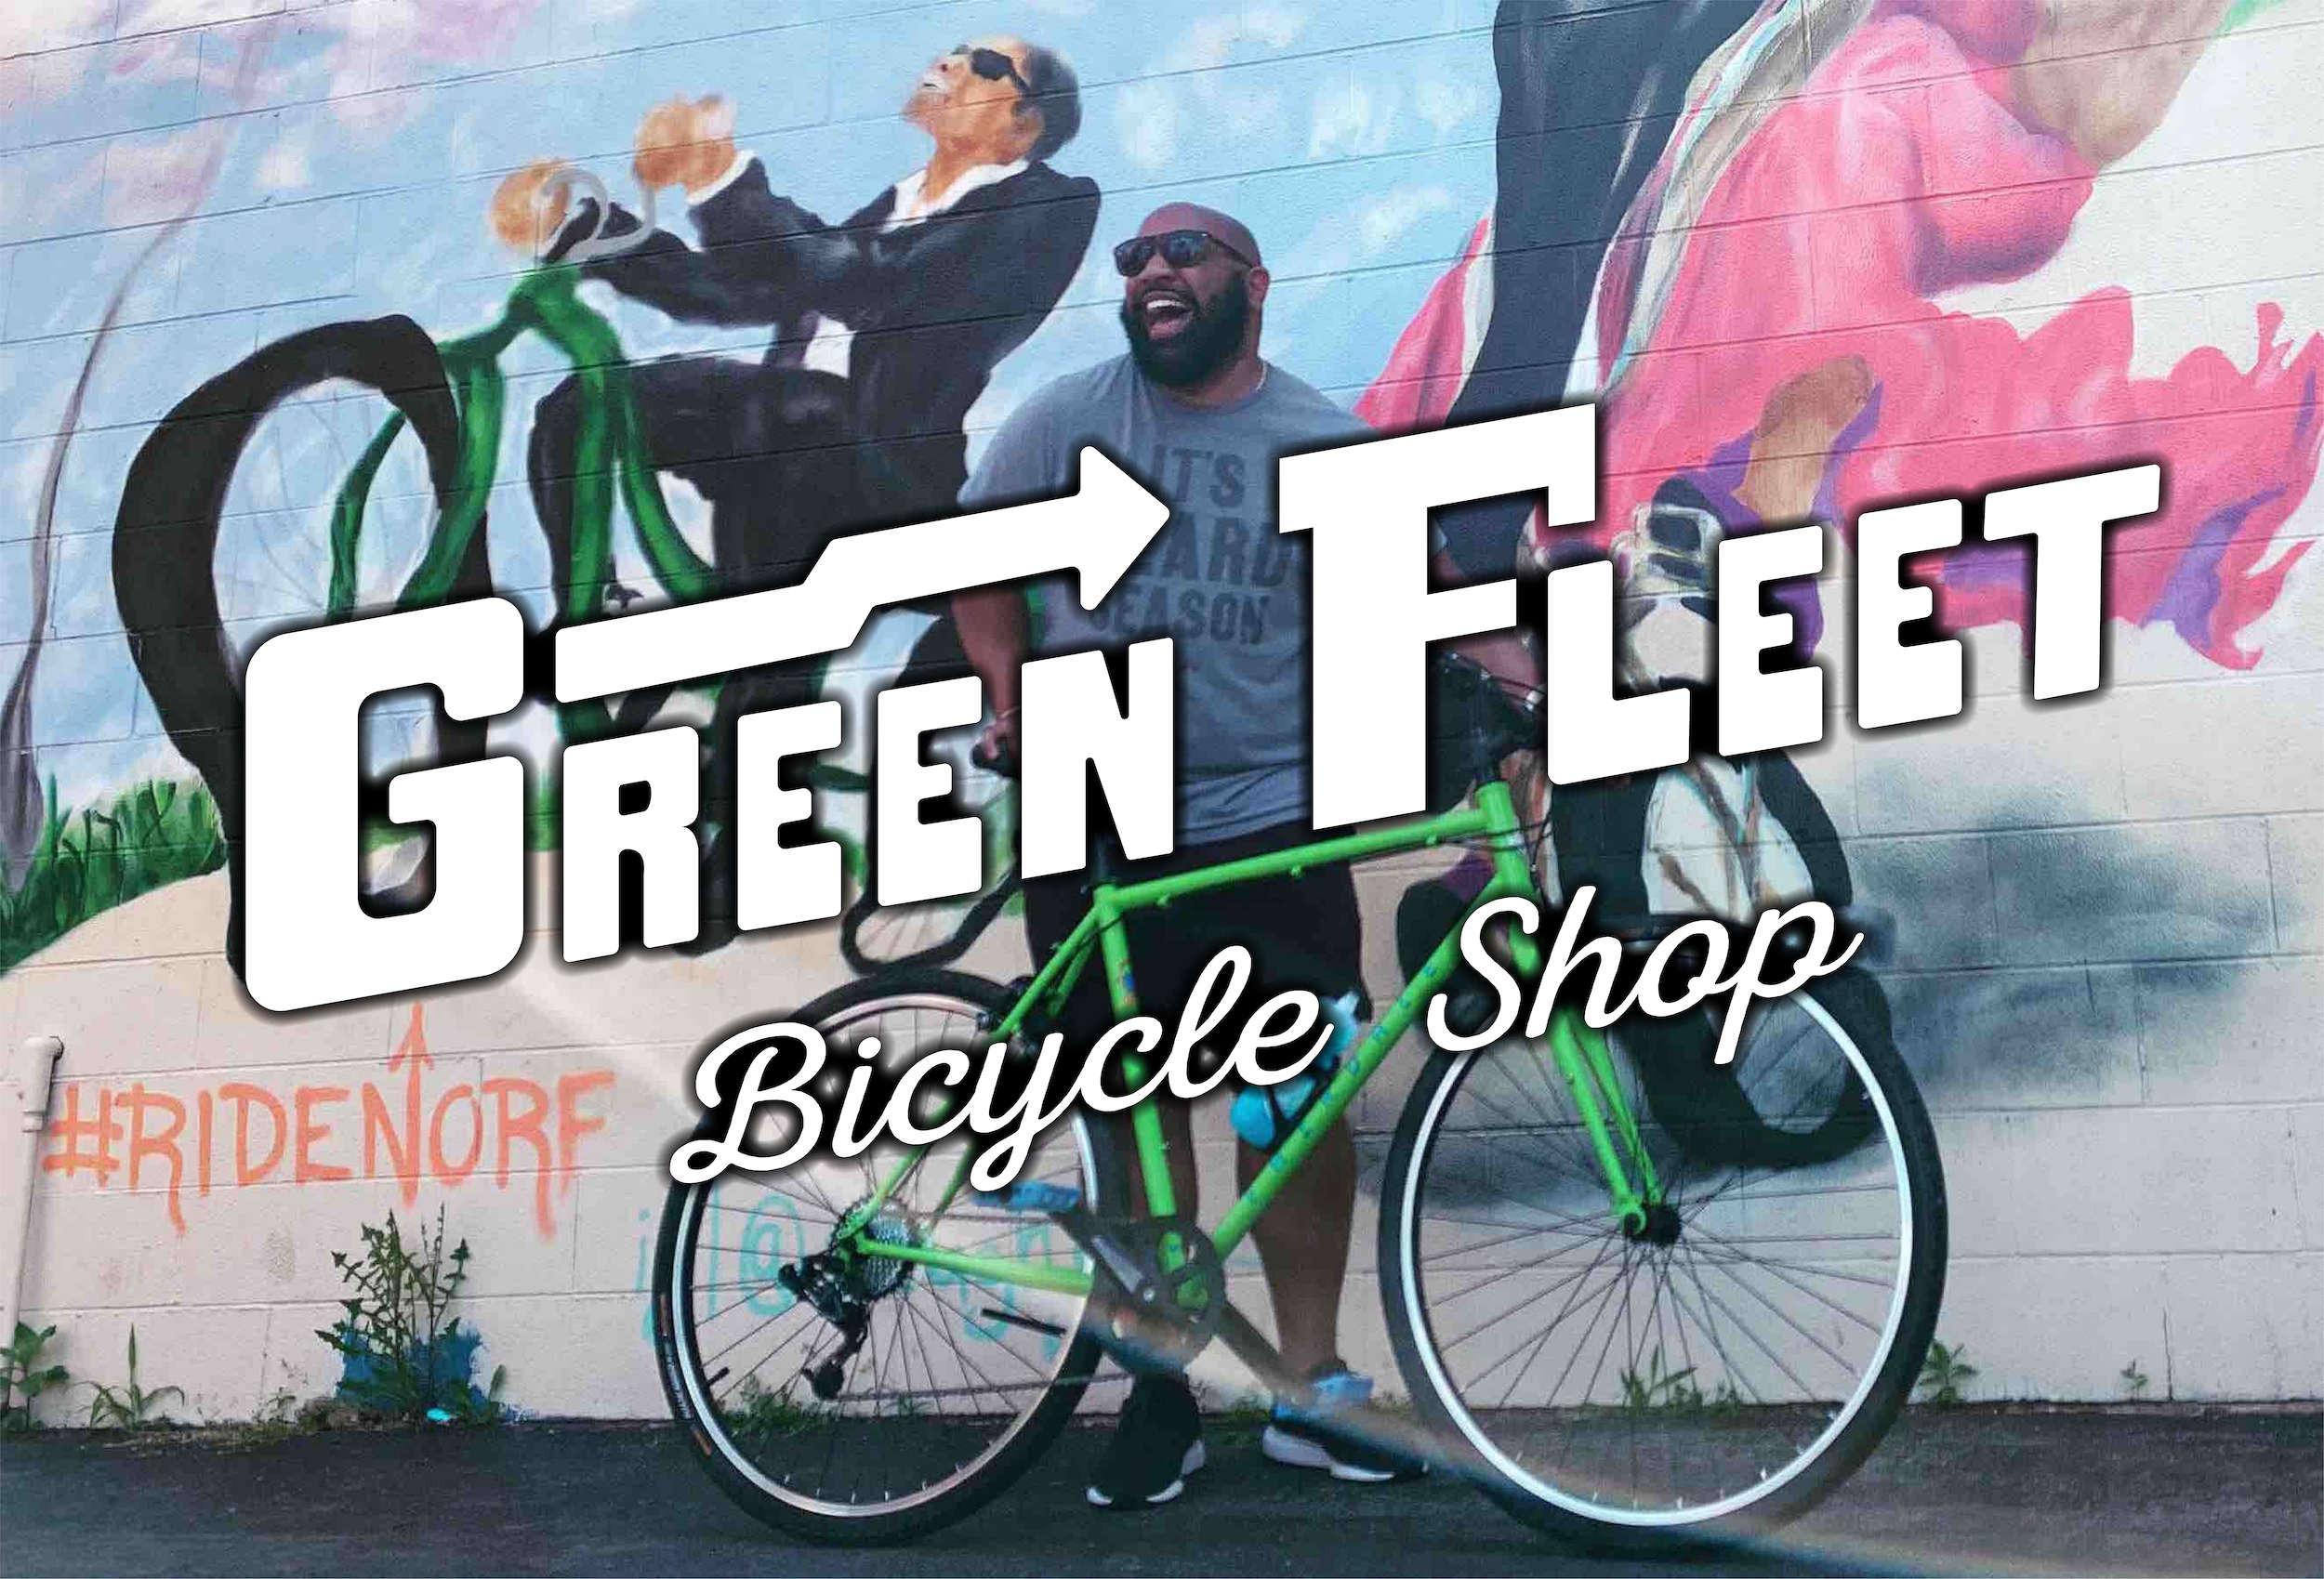 Green Fleet Bicycle Shop pic